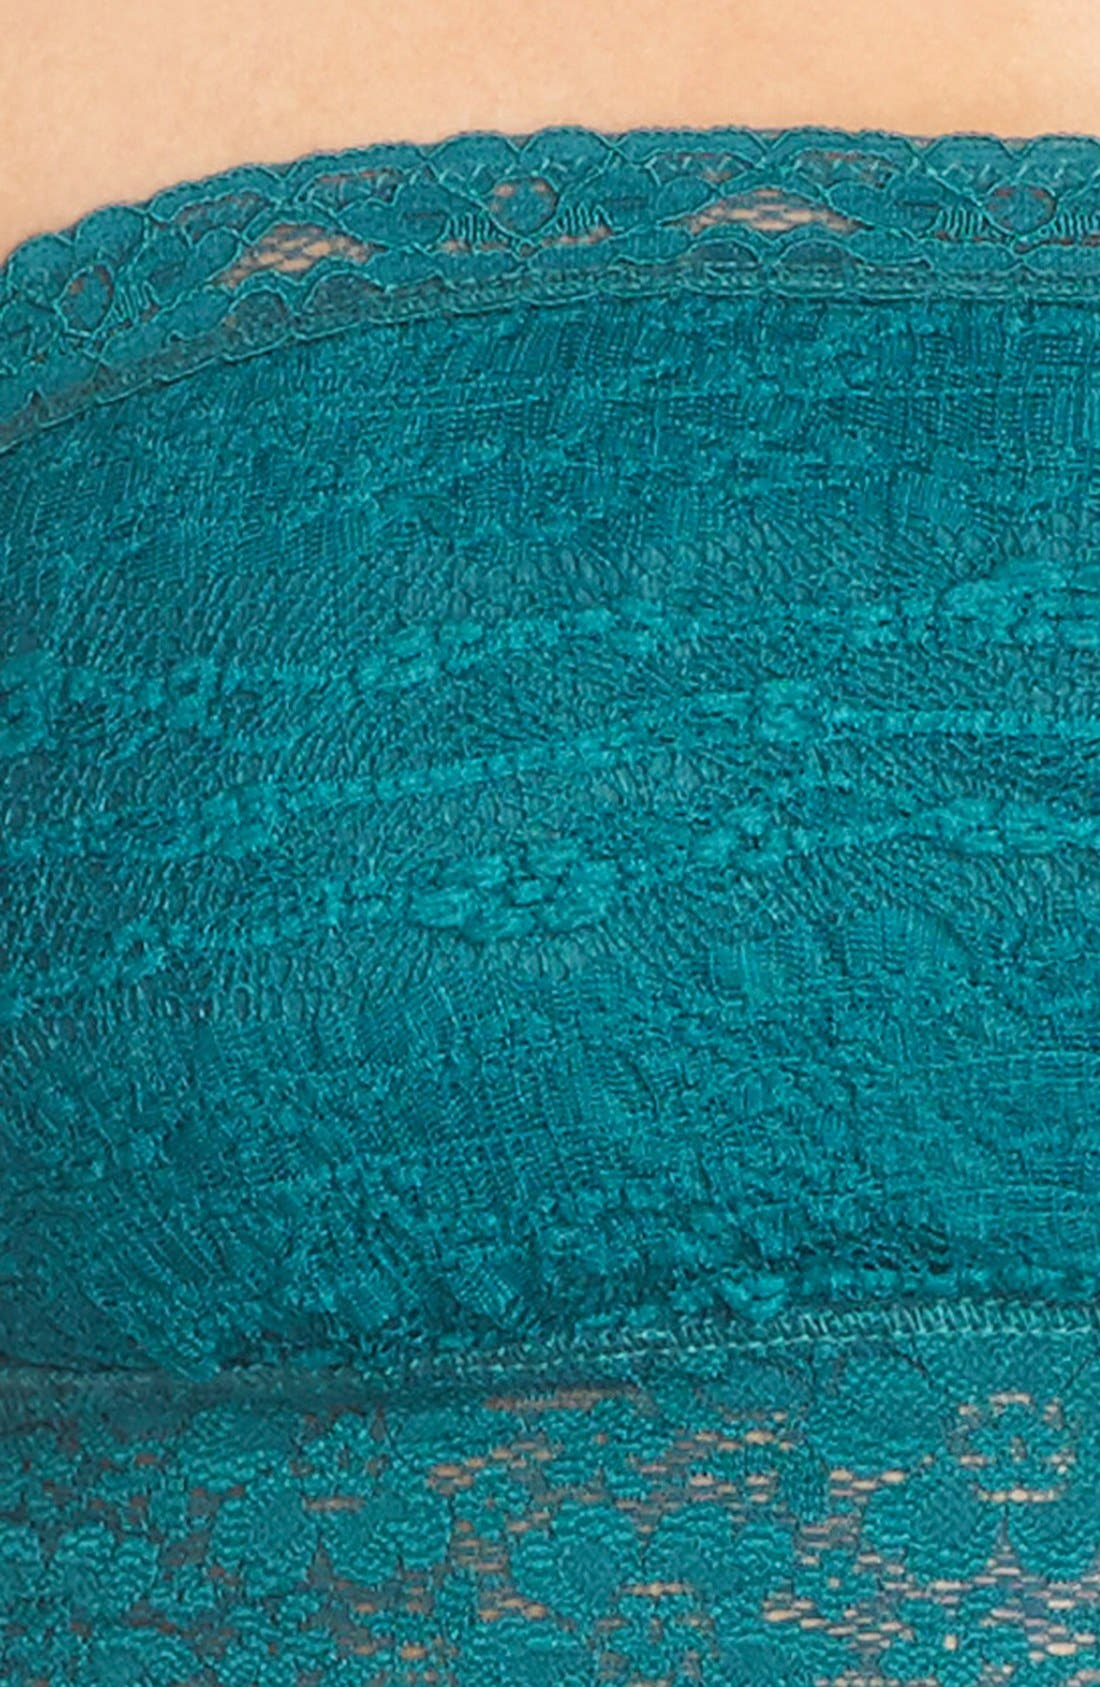 Intimately FP Lace Bandeau Bralette,                             Alternate thumbnail 3, color,                             OCEAN